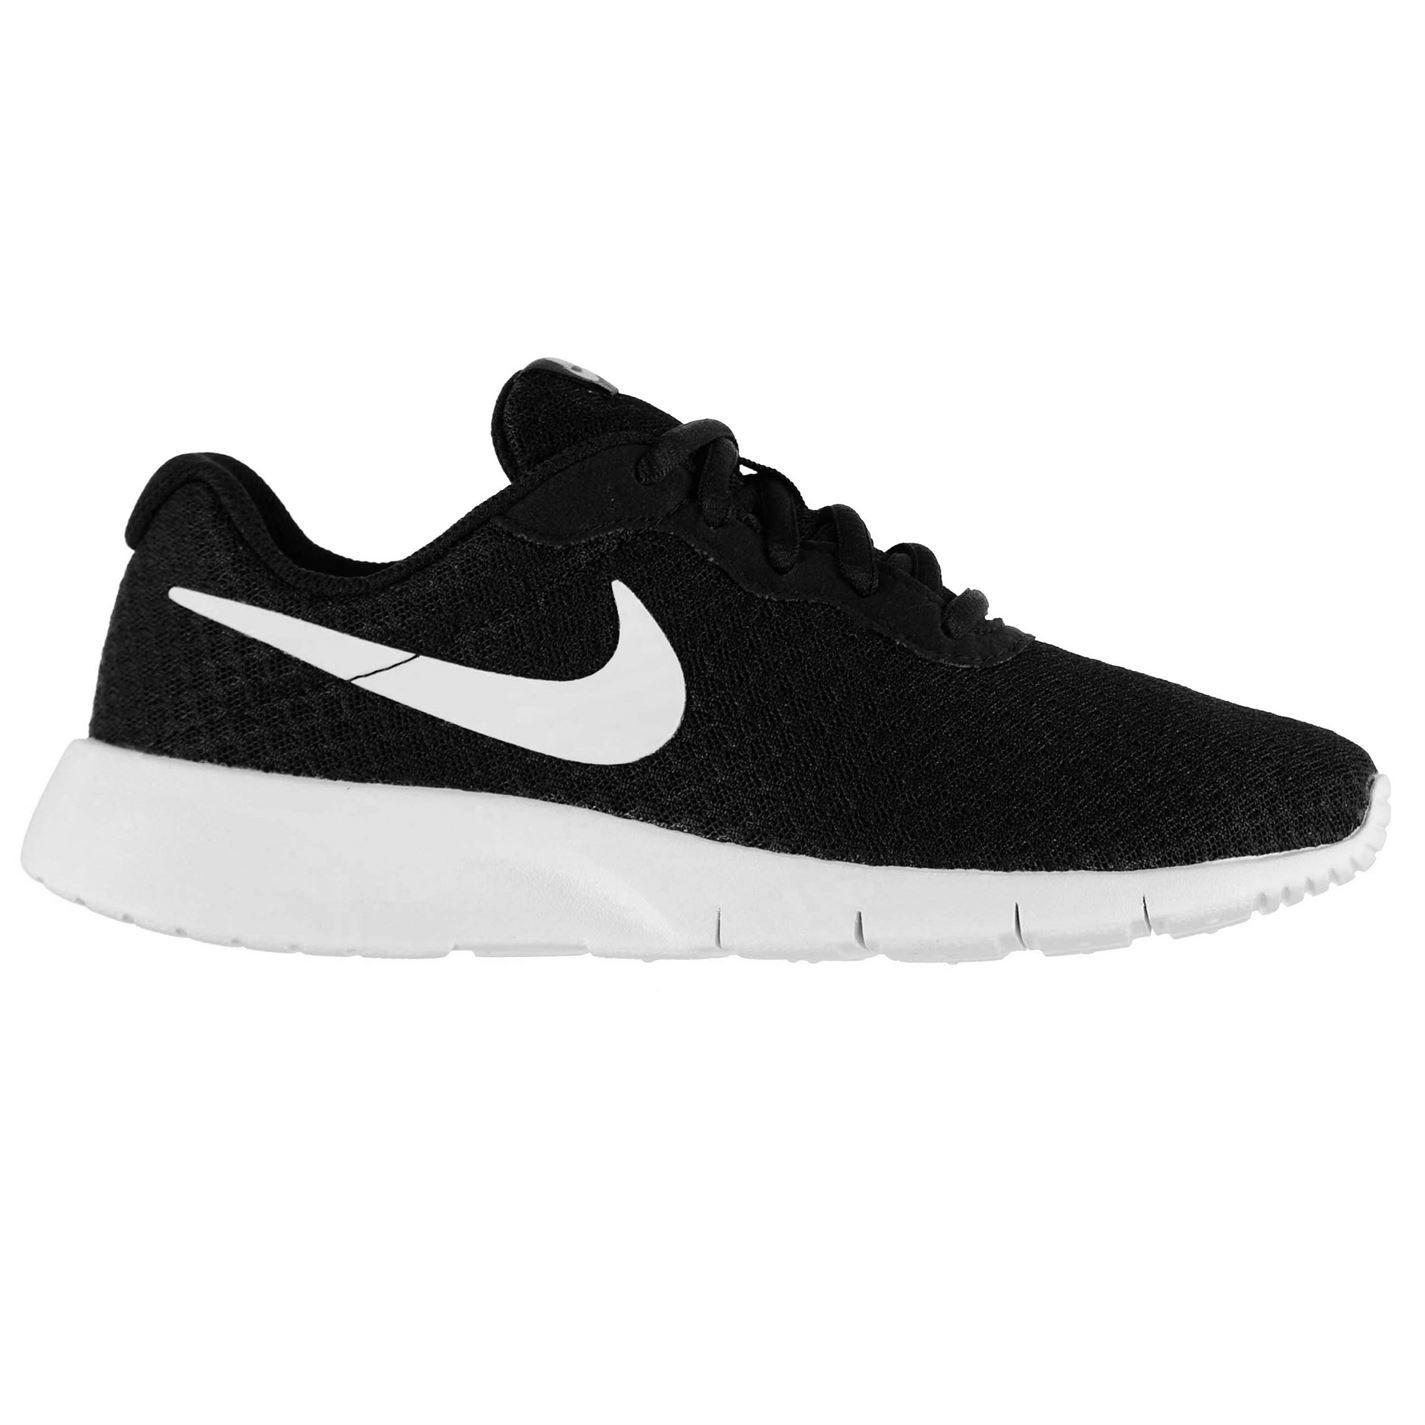 Nike Tanjun Junior Boys Trainers Shoes Footwear | eBay